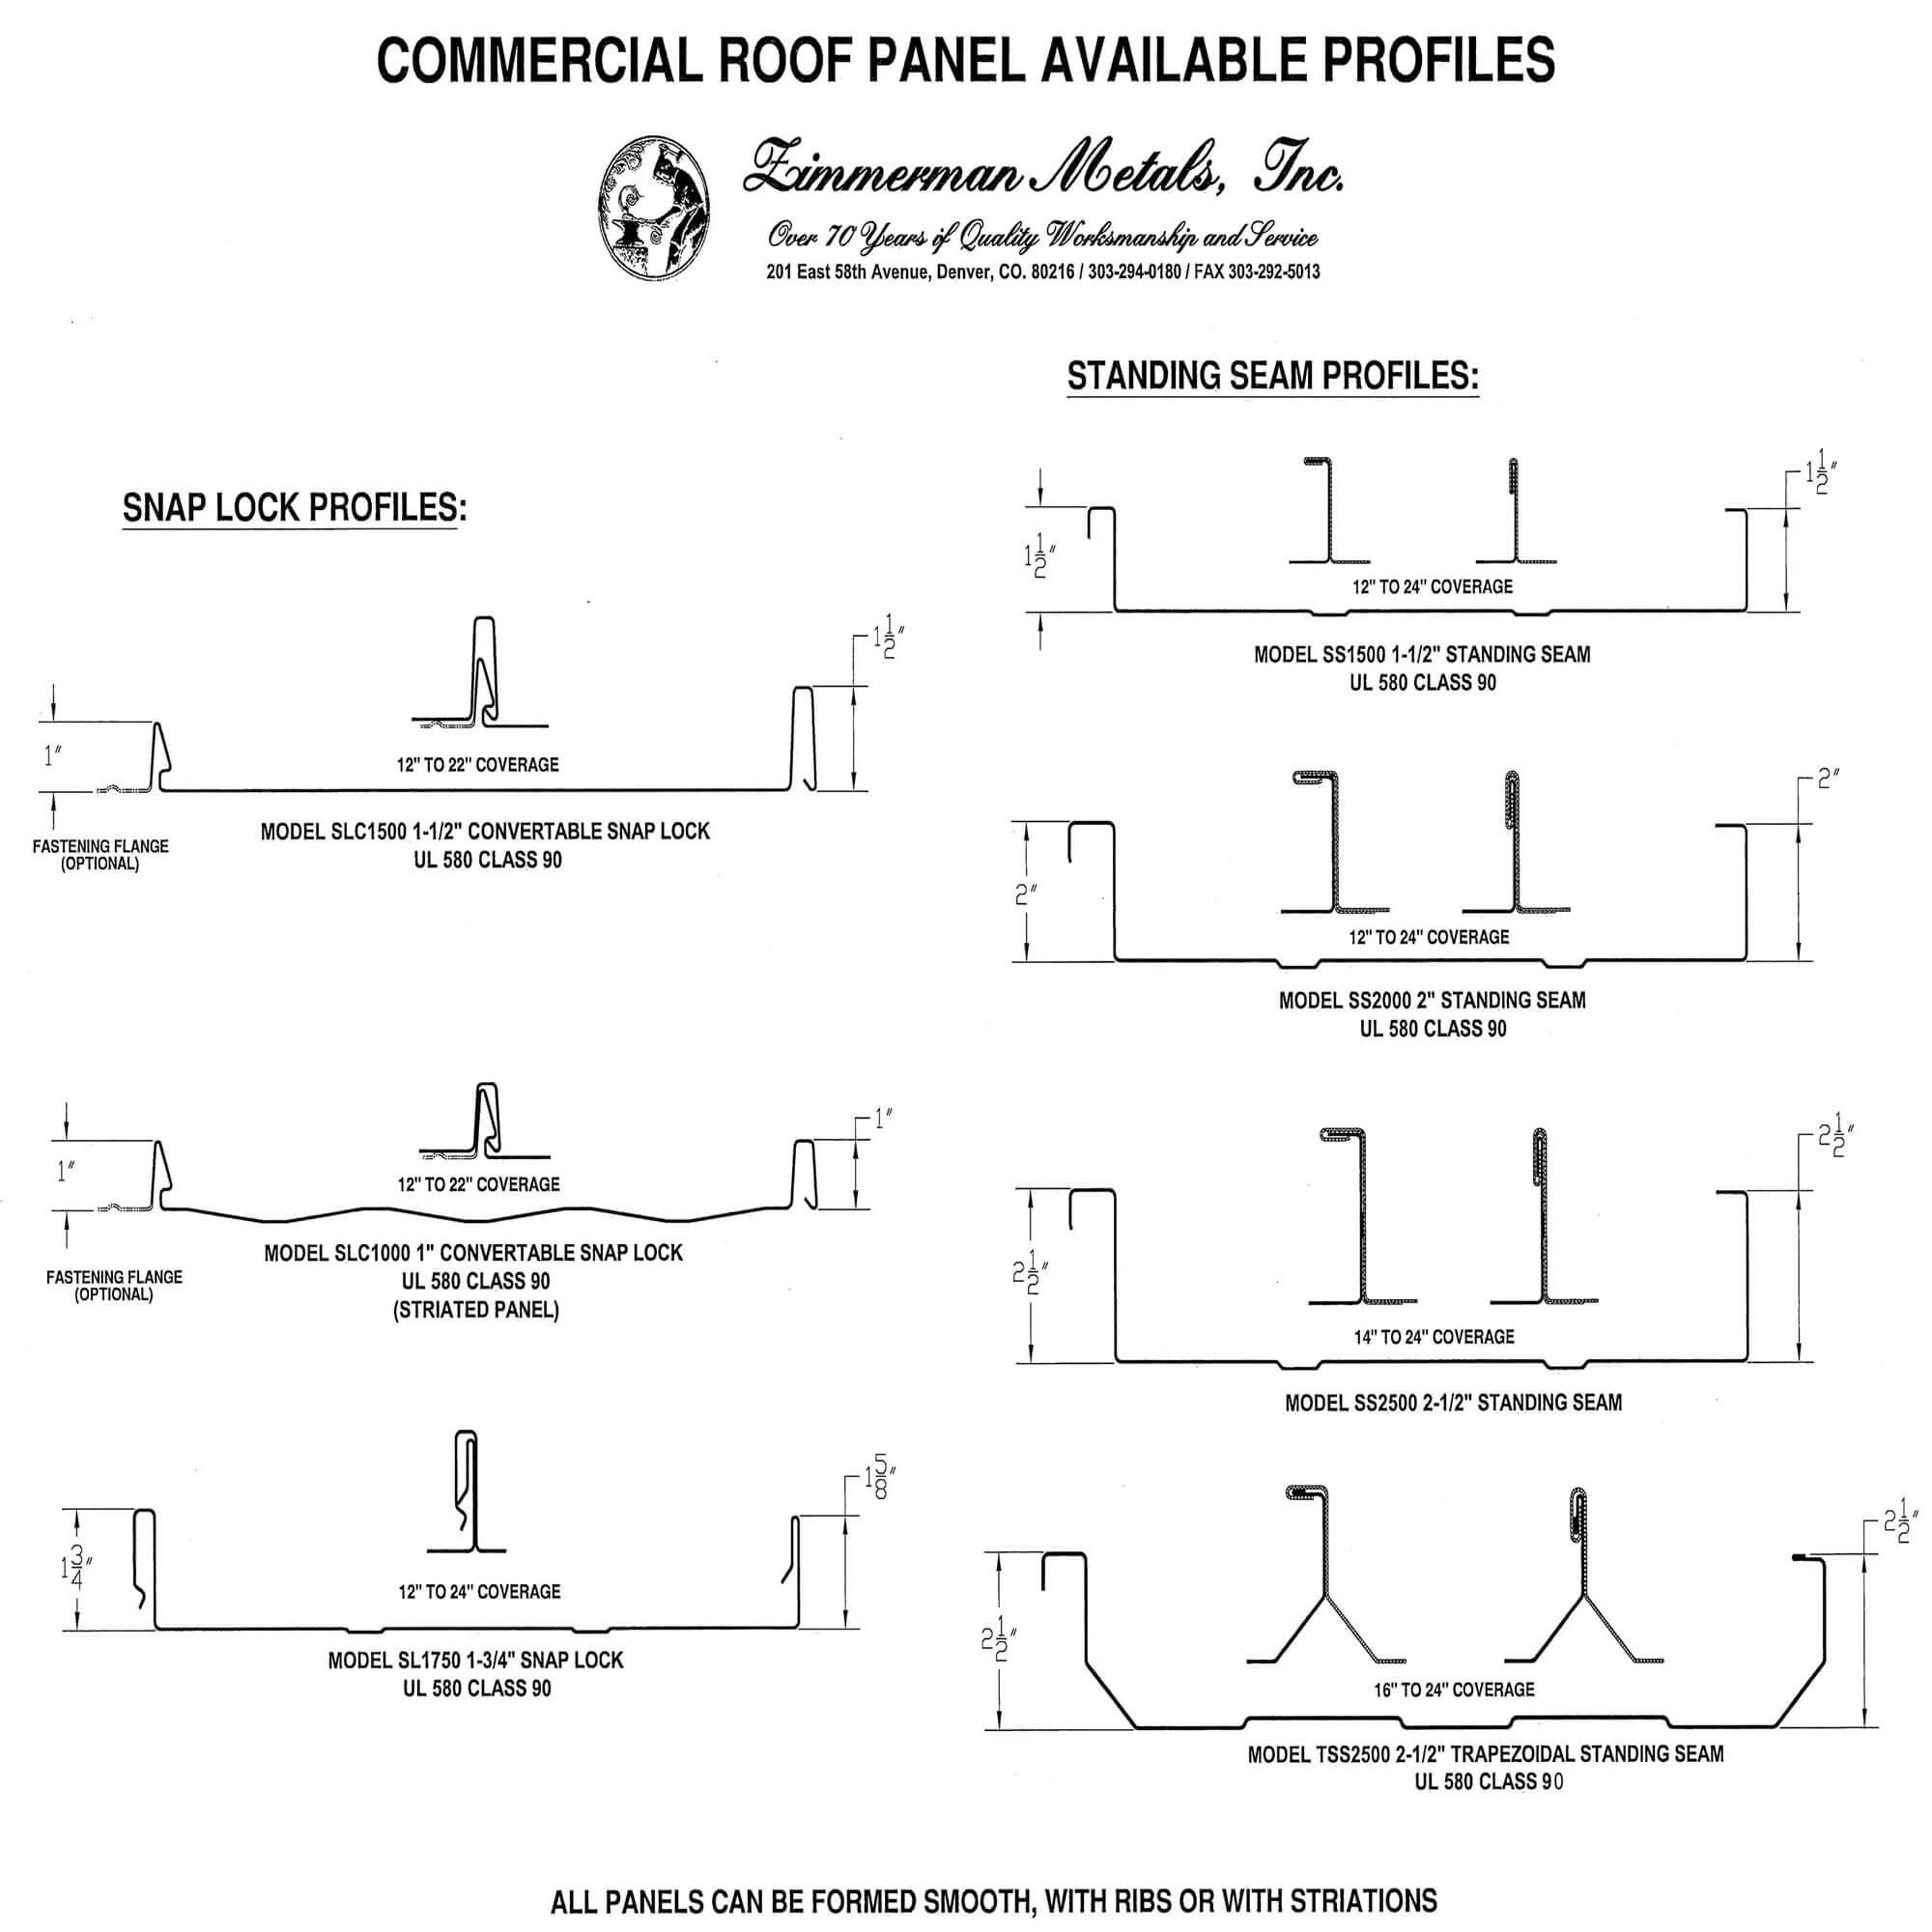 CRPM Profiles 2014 - EZ Metal